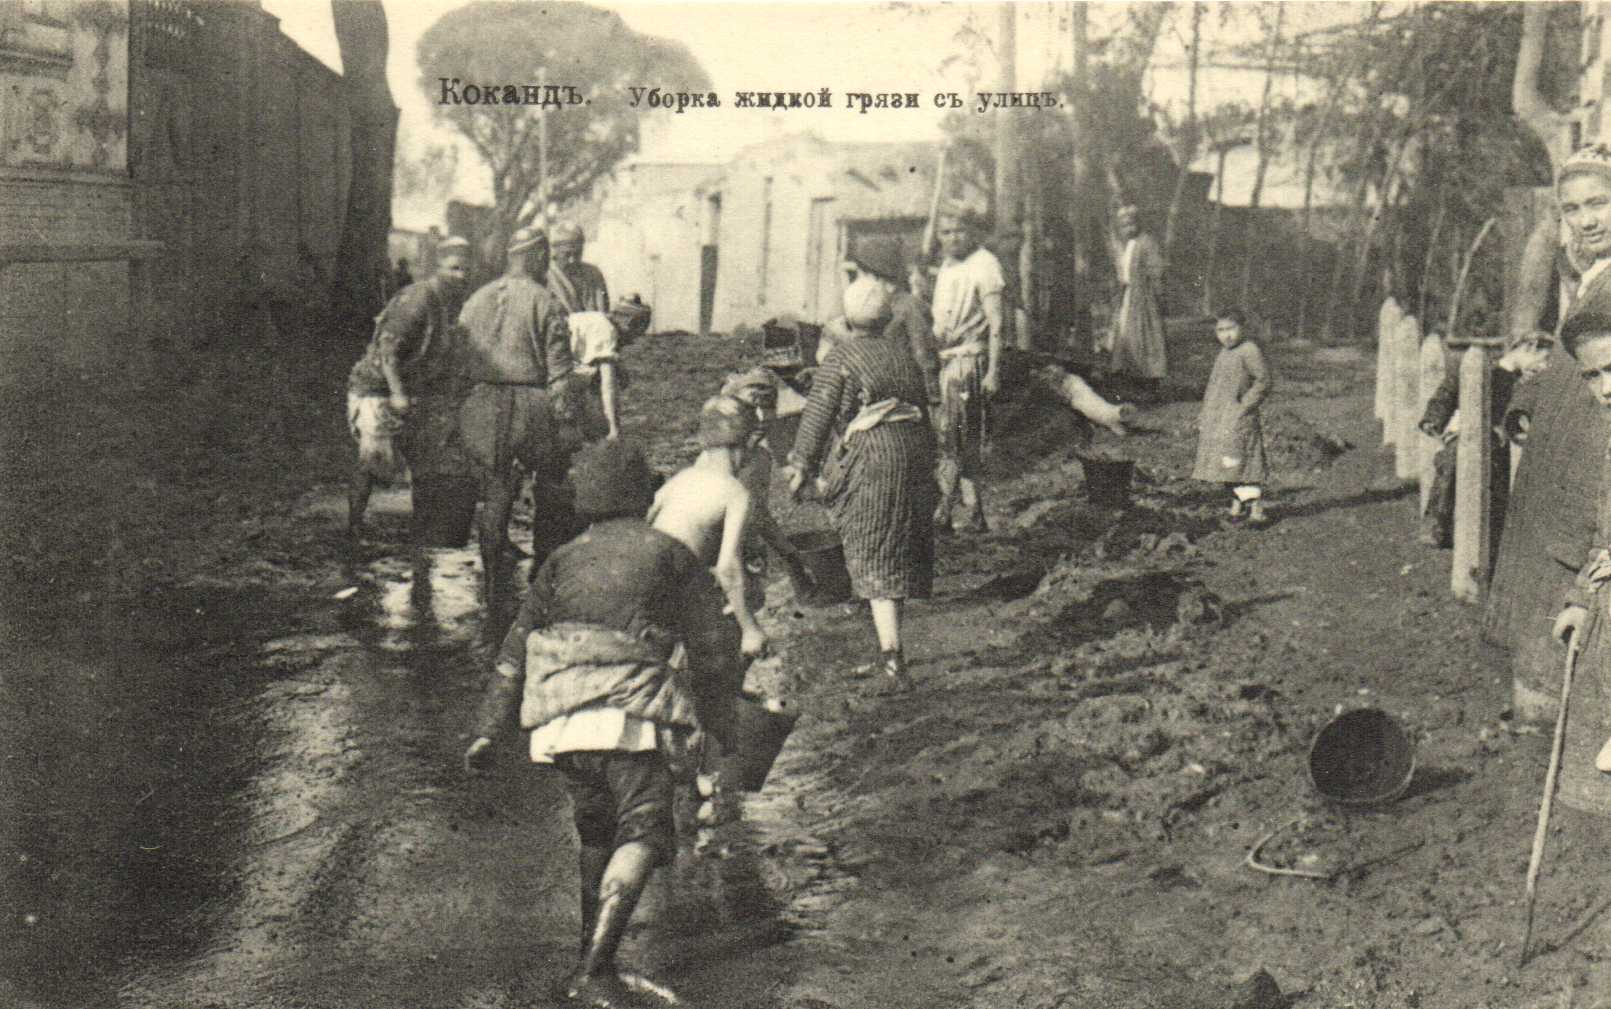 Уборка жидкой грязи с улиц